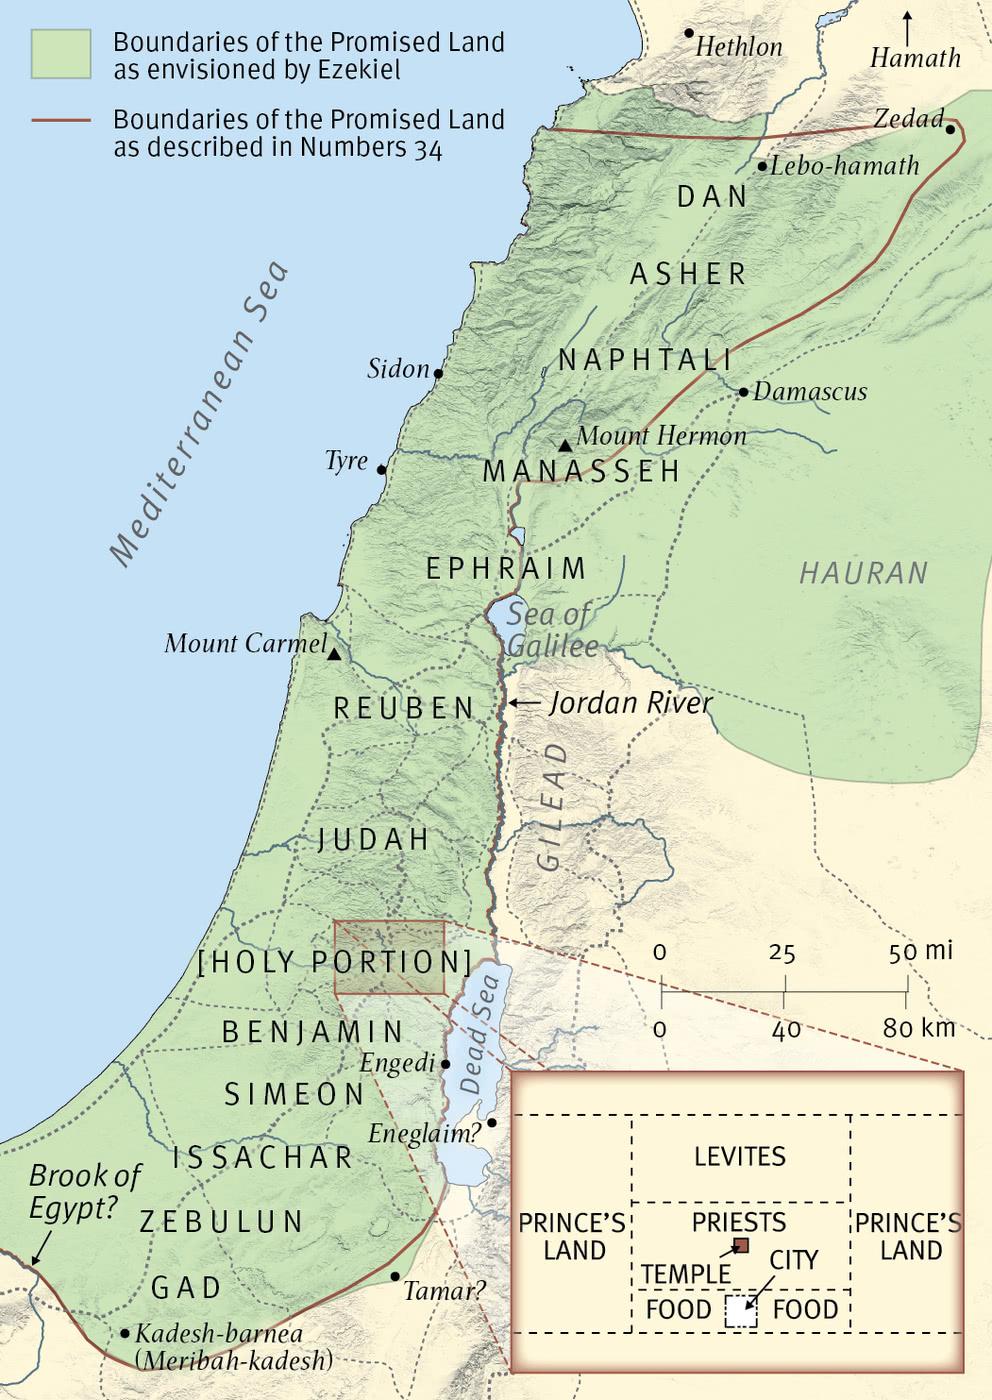 Ezekiel's Vision of Israel's New Boundaries